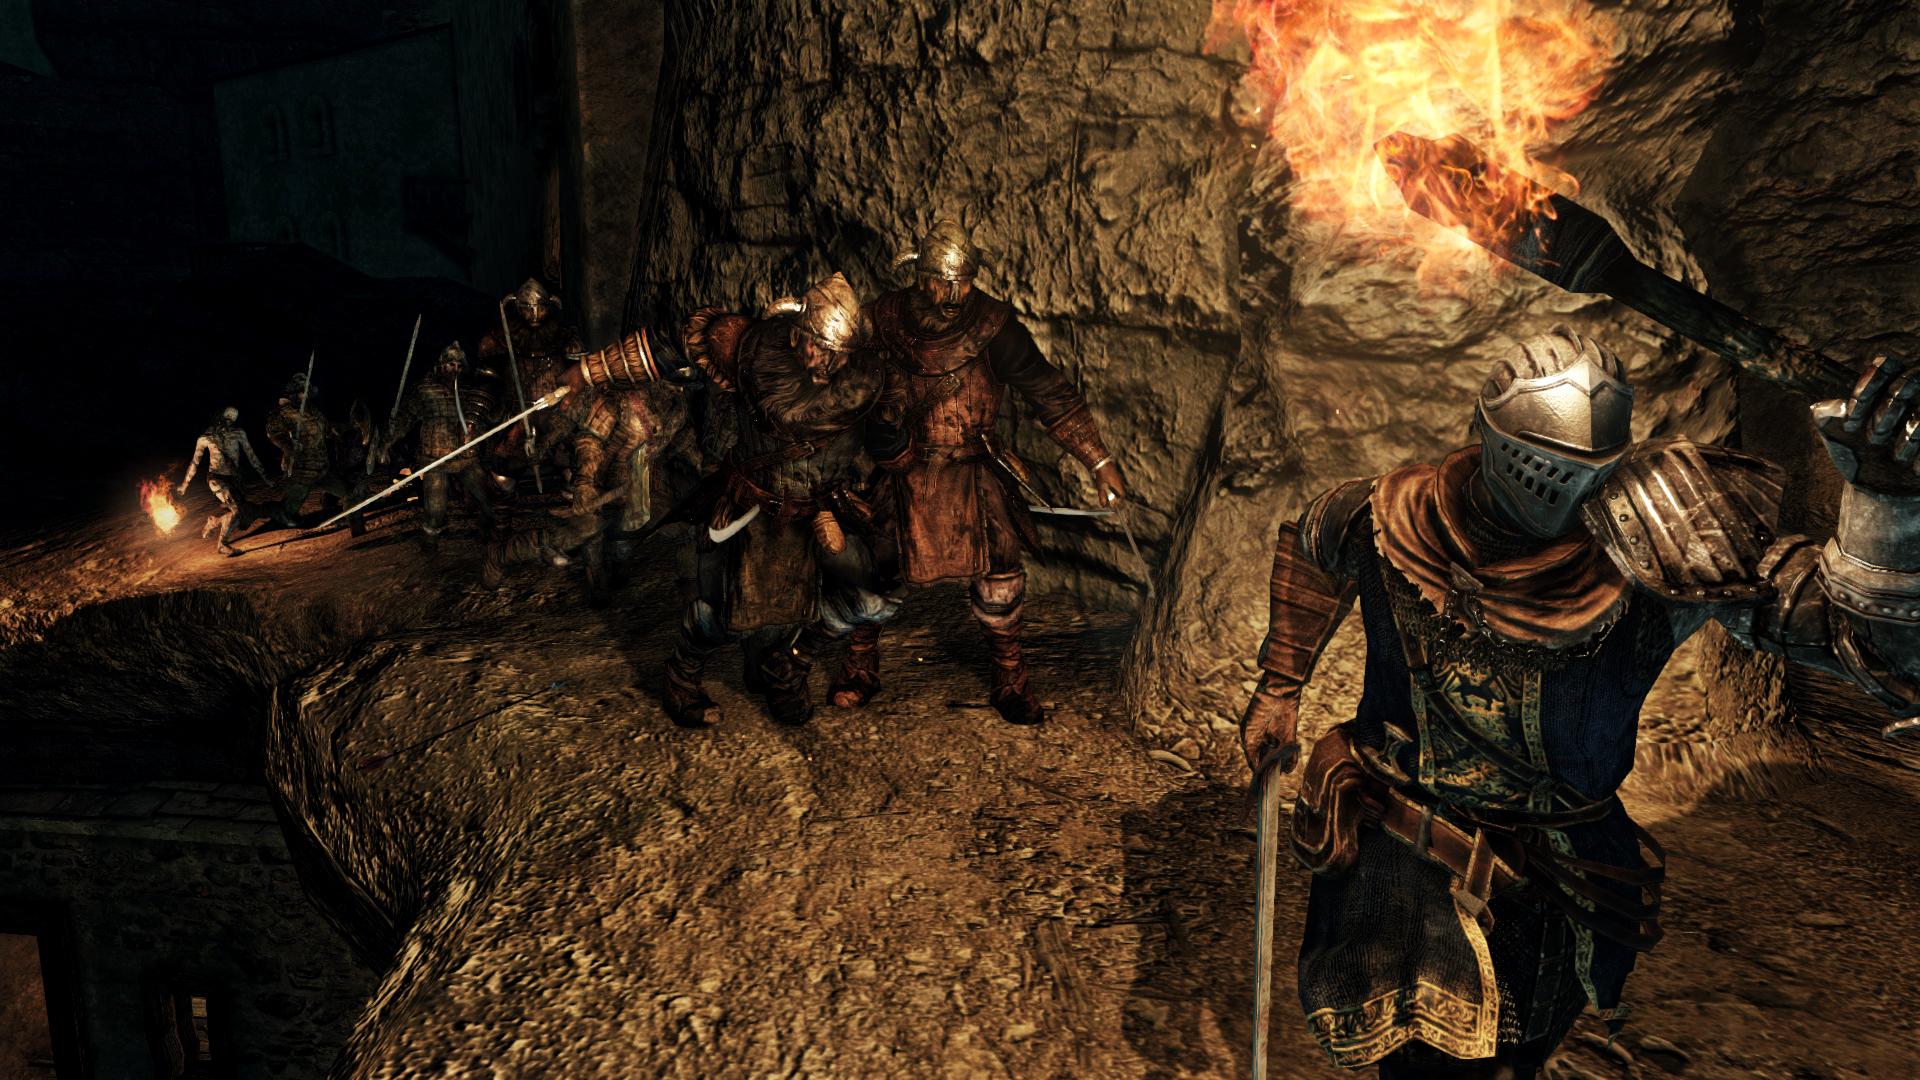 Obrazem: Temné dungeony, kostlivci a monstra z Dark Souls 2: Scholar of the First Sin 107552